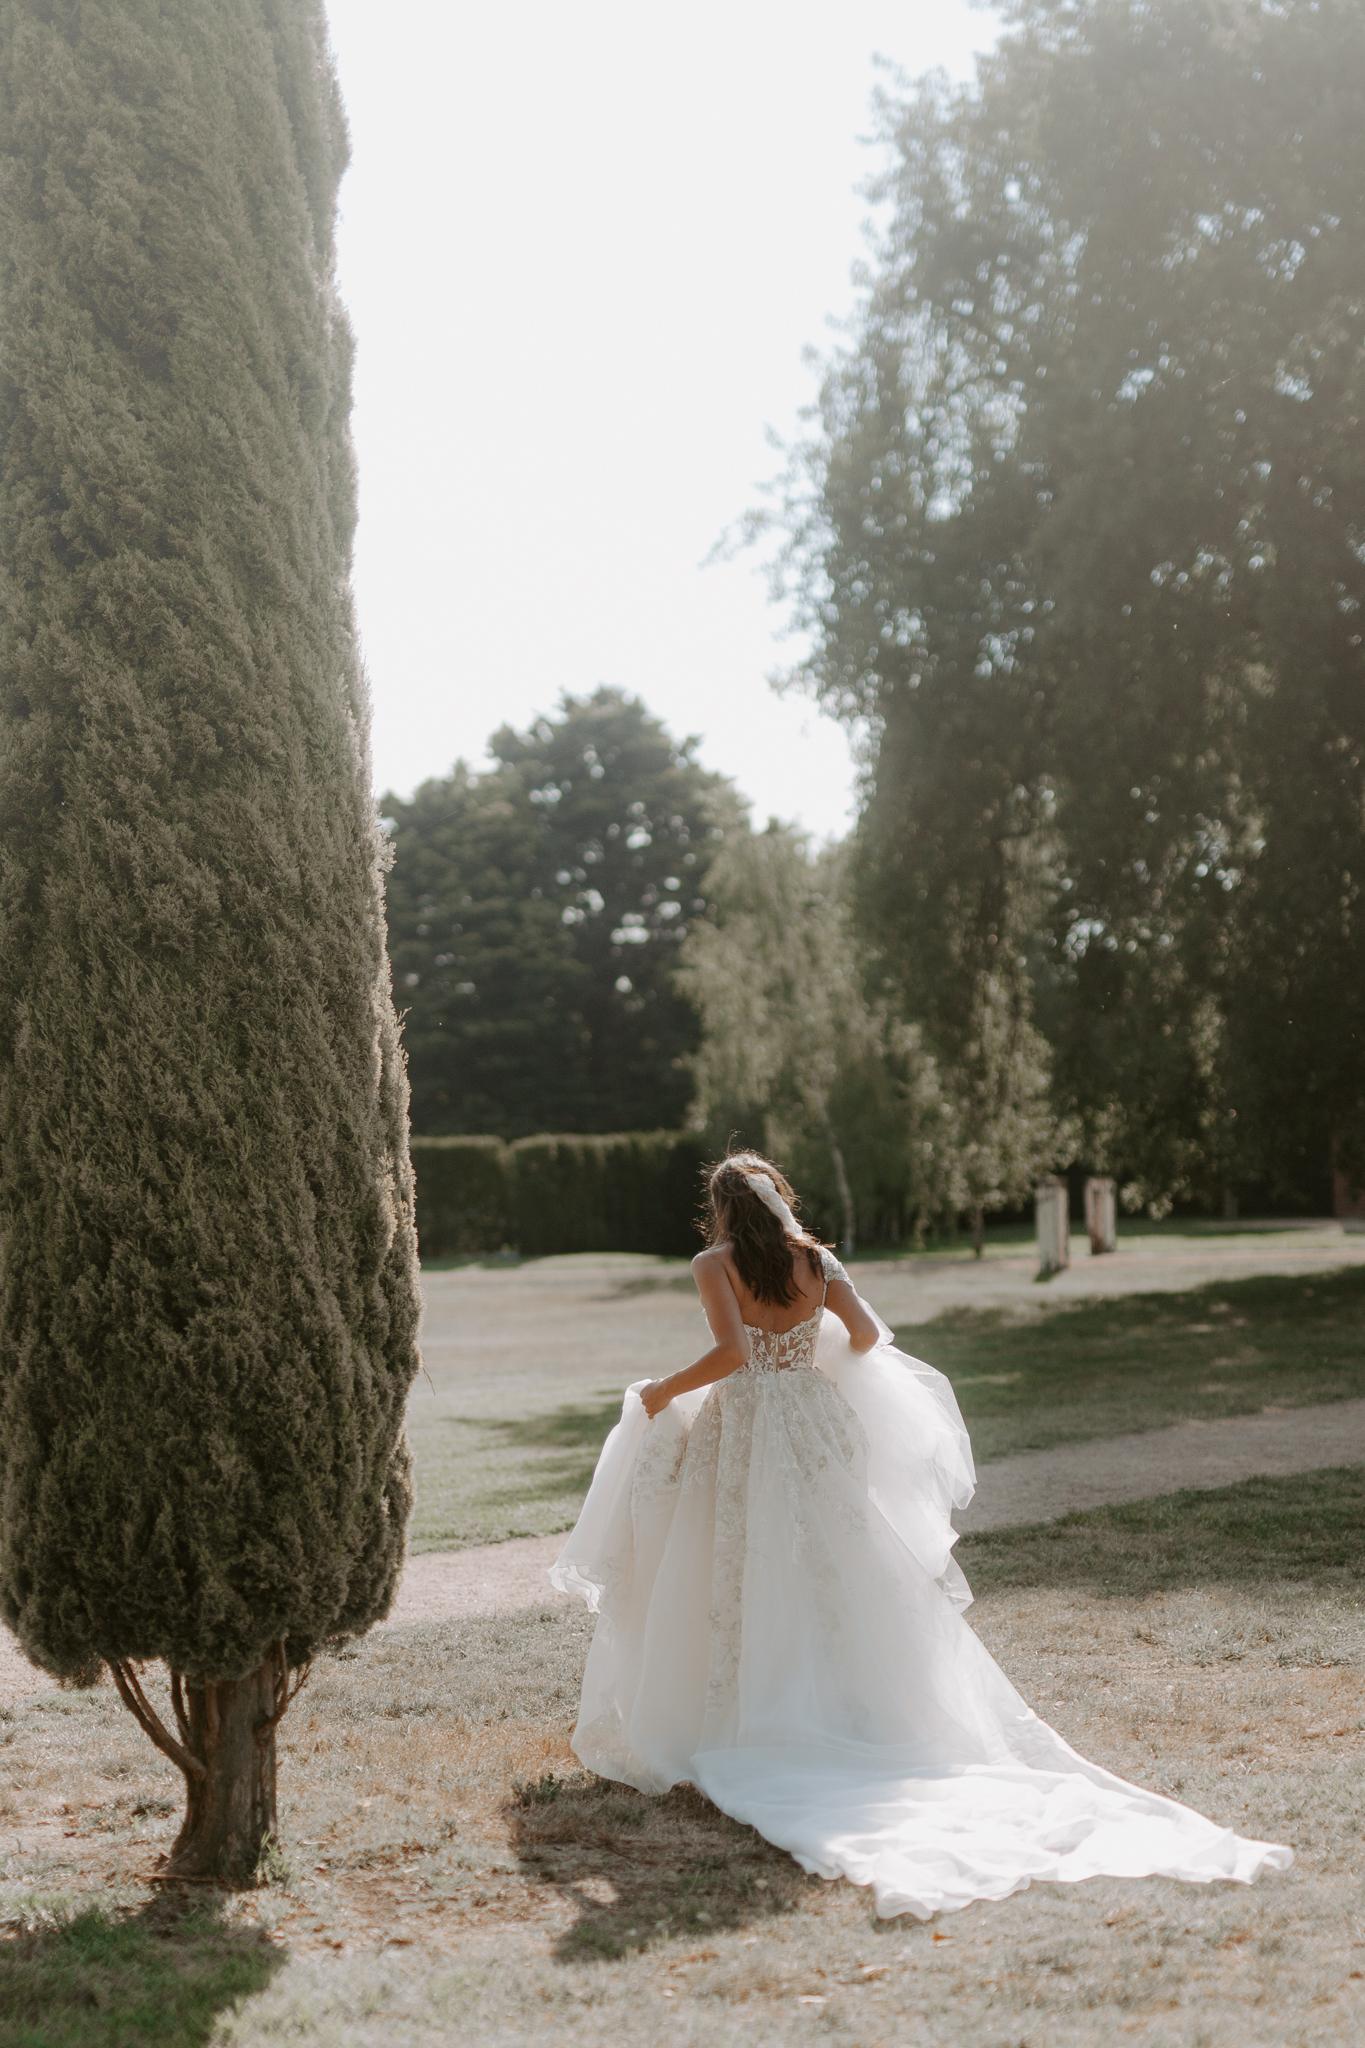 The-Stones-of-Yarra-Valley-Wedding-EmotionsandMathPhotography-139.jpg